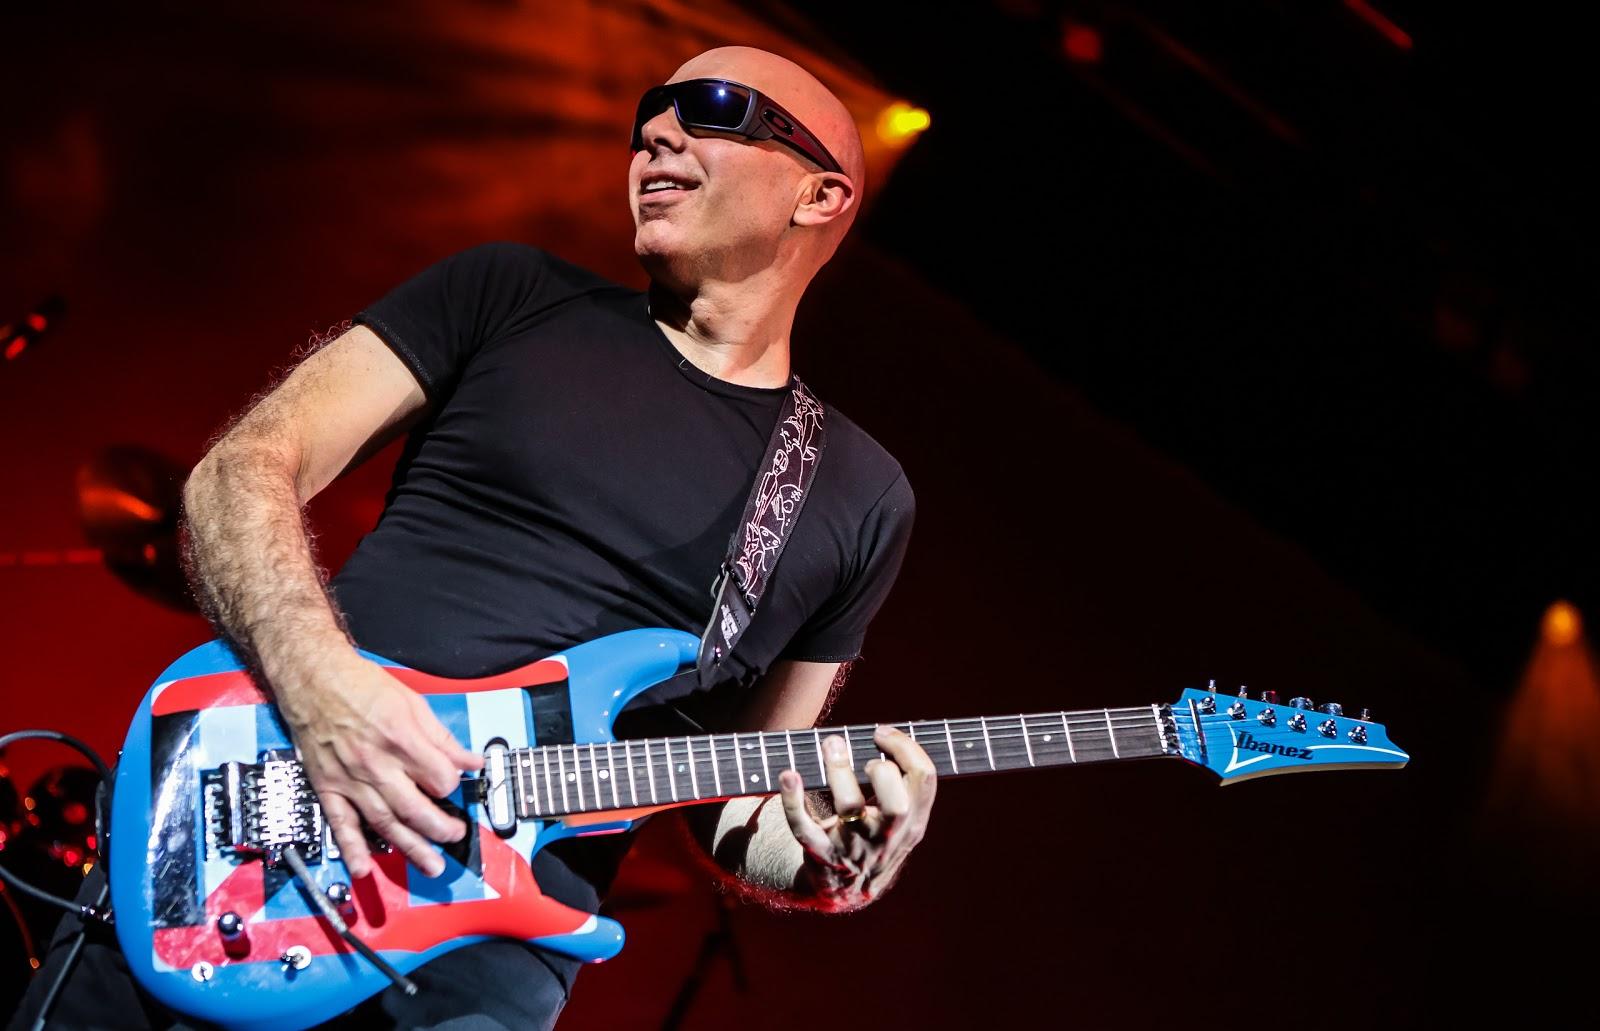 15 luglio 1956 - nasce Joe Satriani